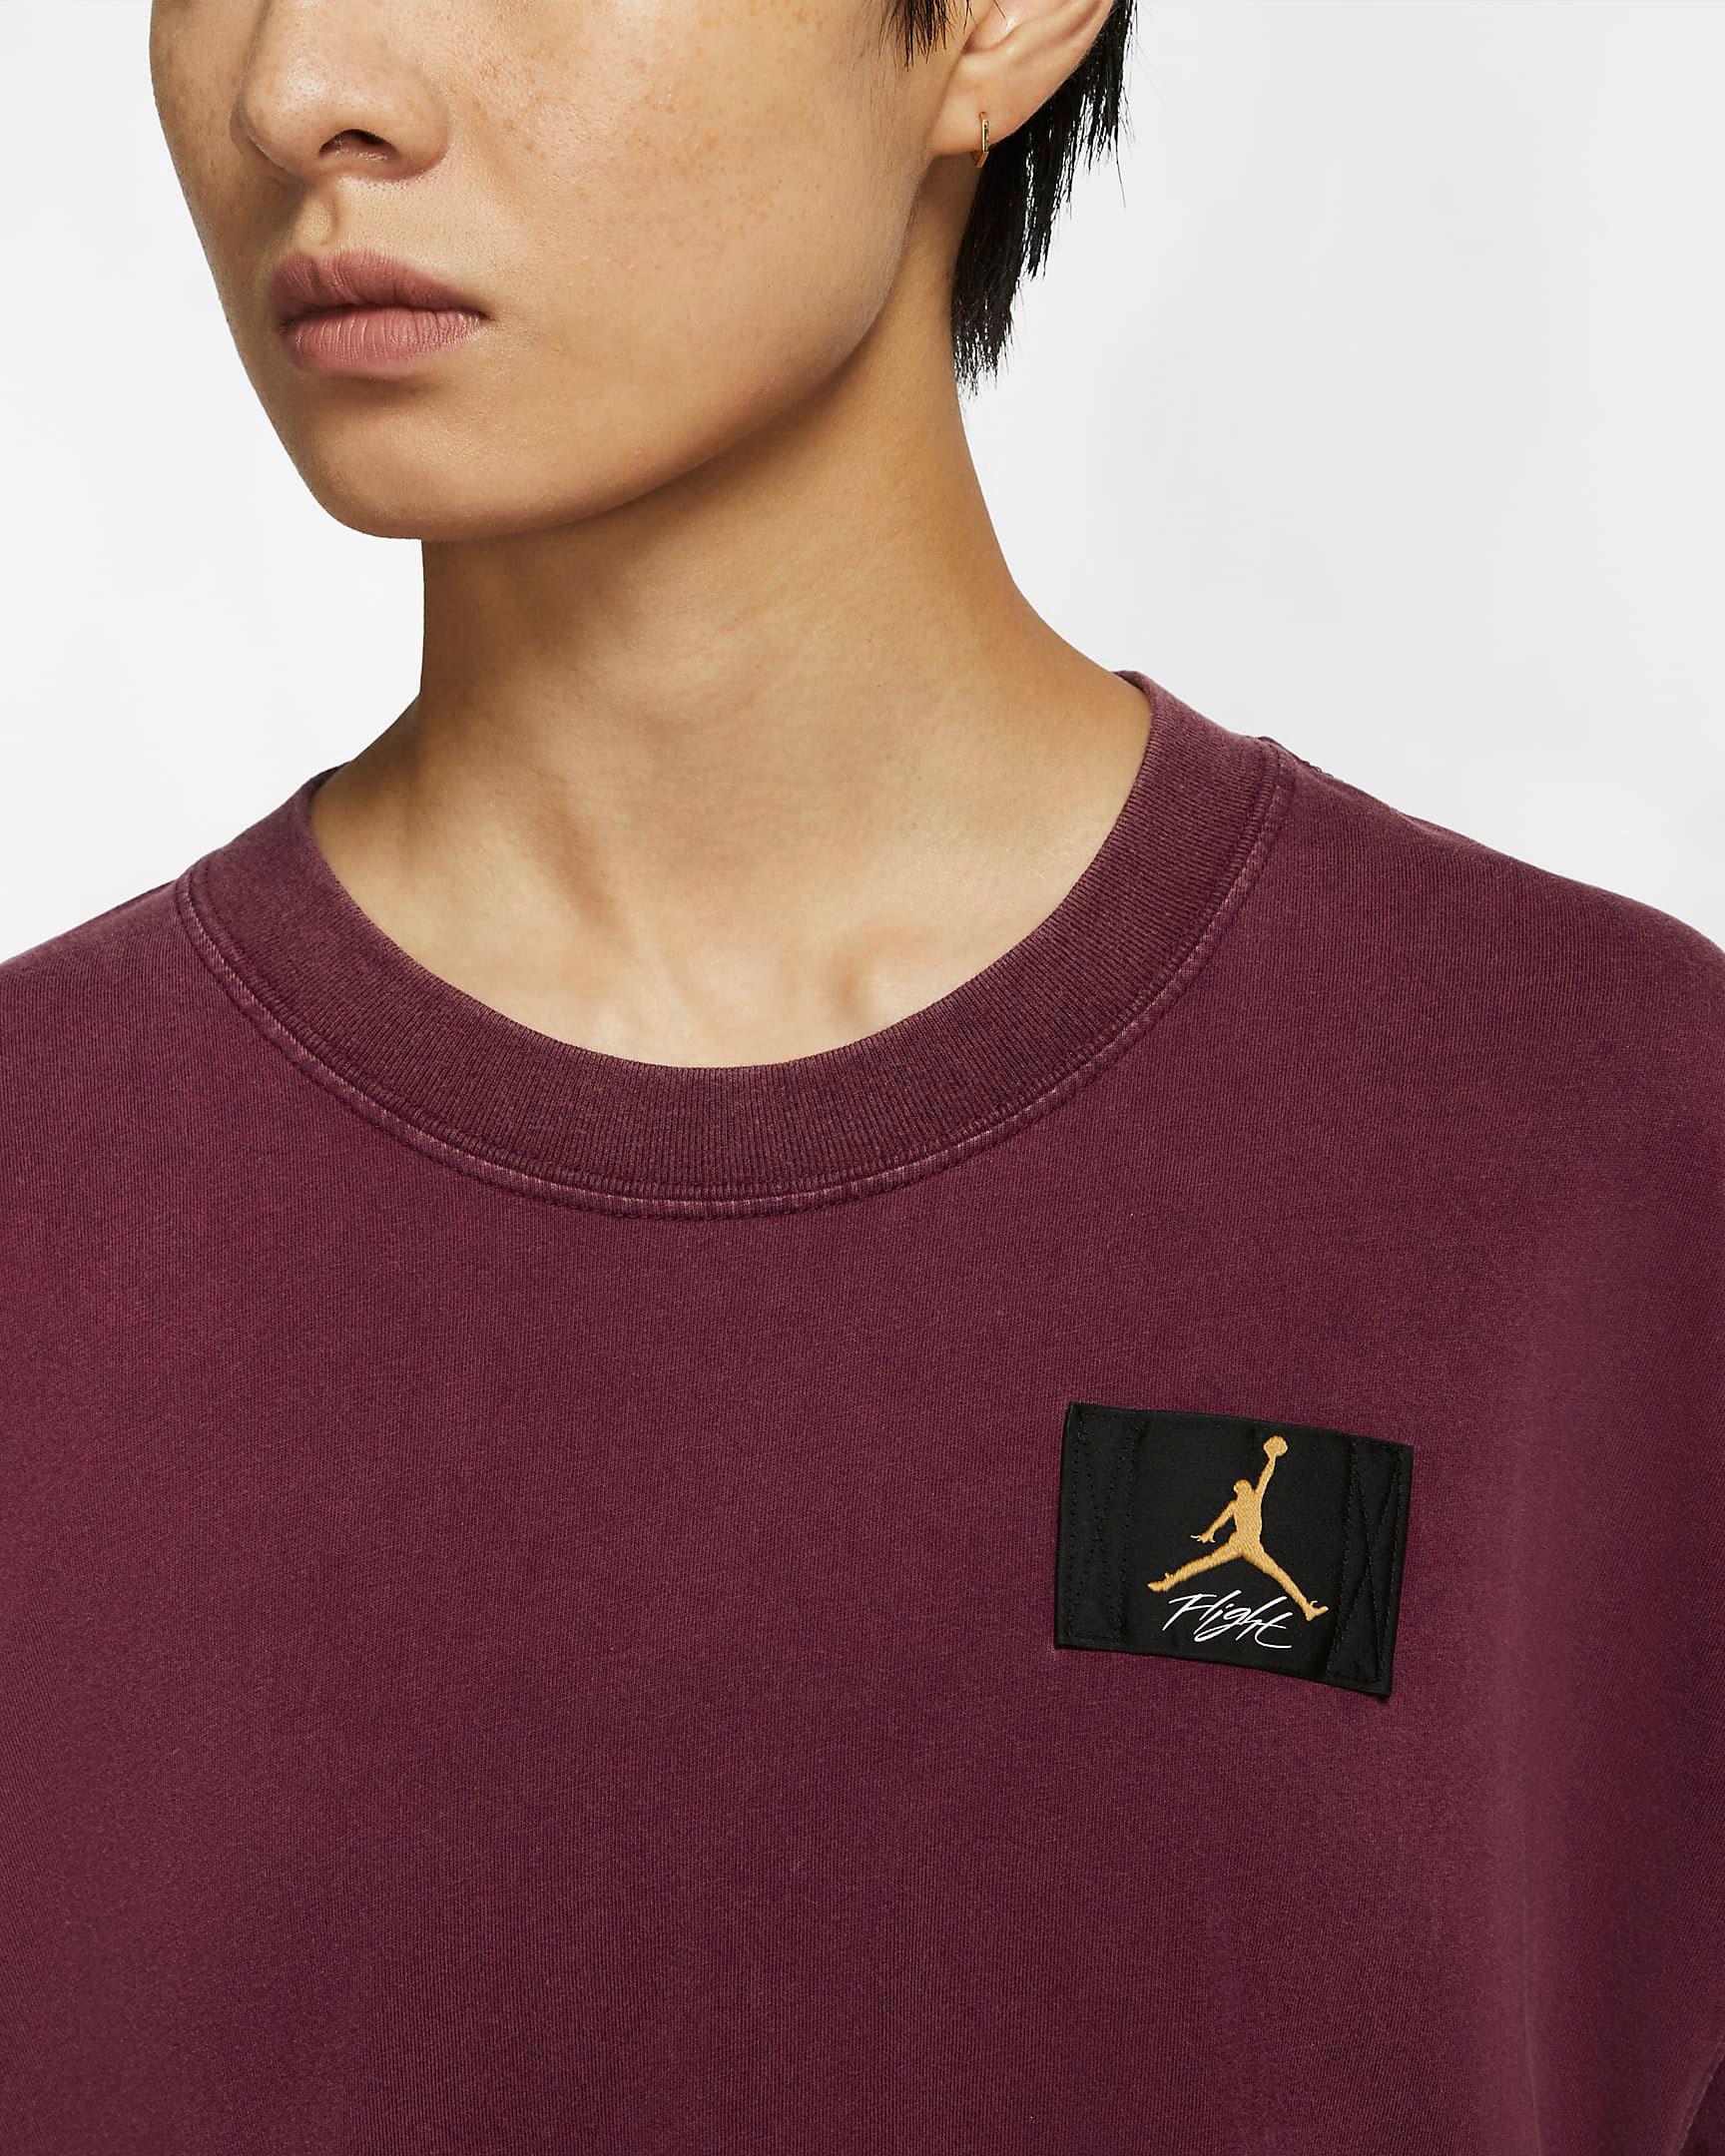 jordan-womens-flight-shirt-bordeaux-laser-orange-1